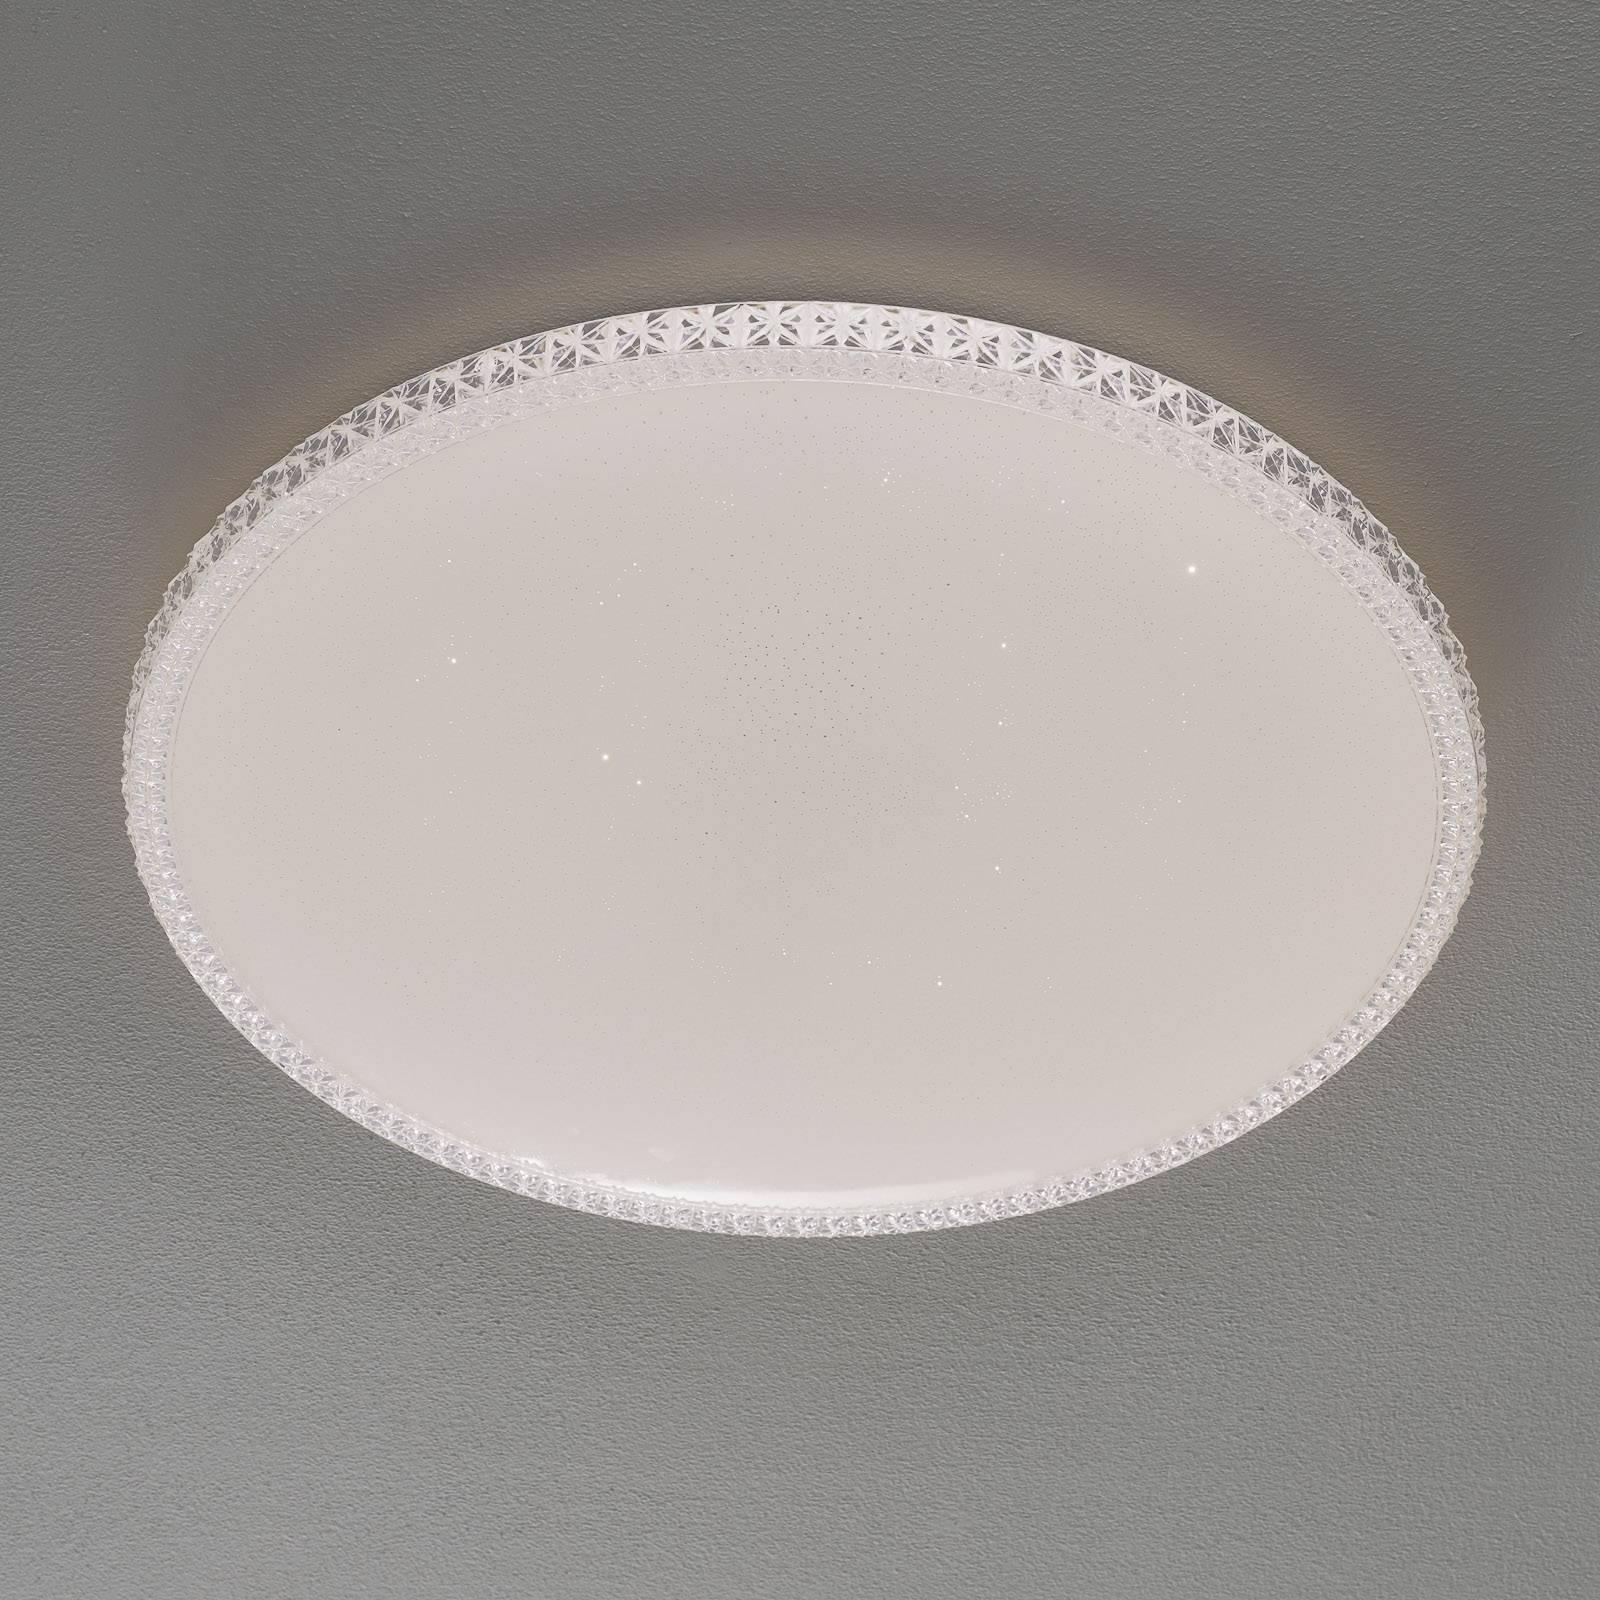 Lampa sufitowa LED 3386-016 z pilotem